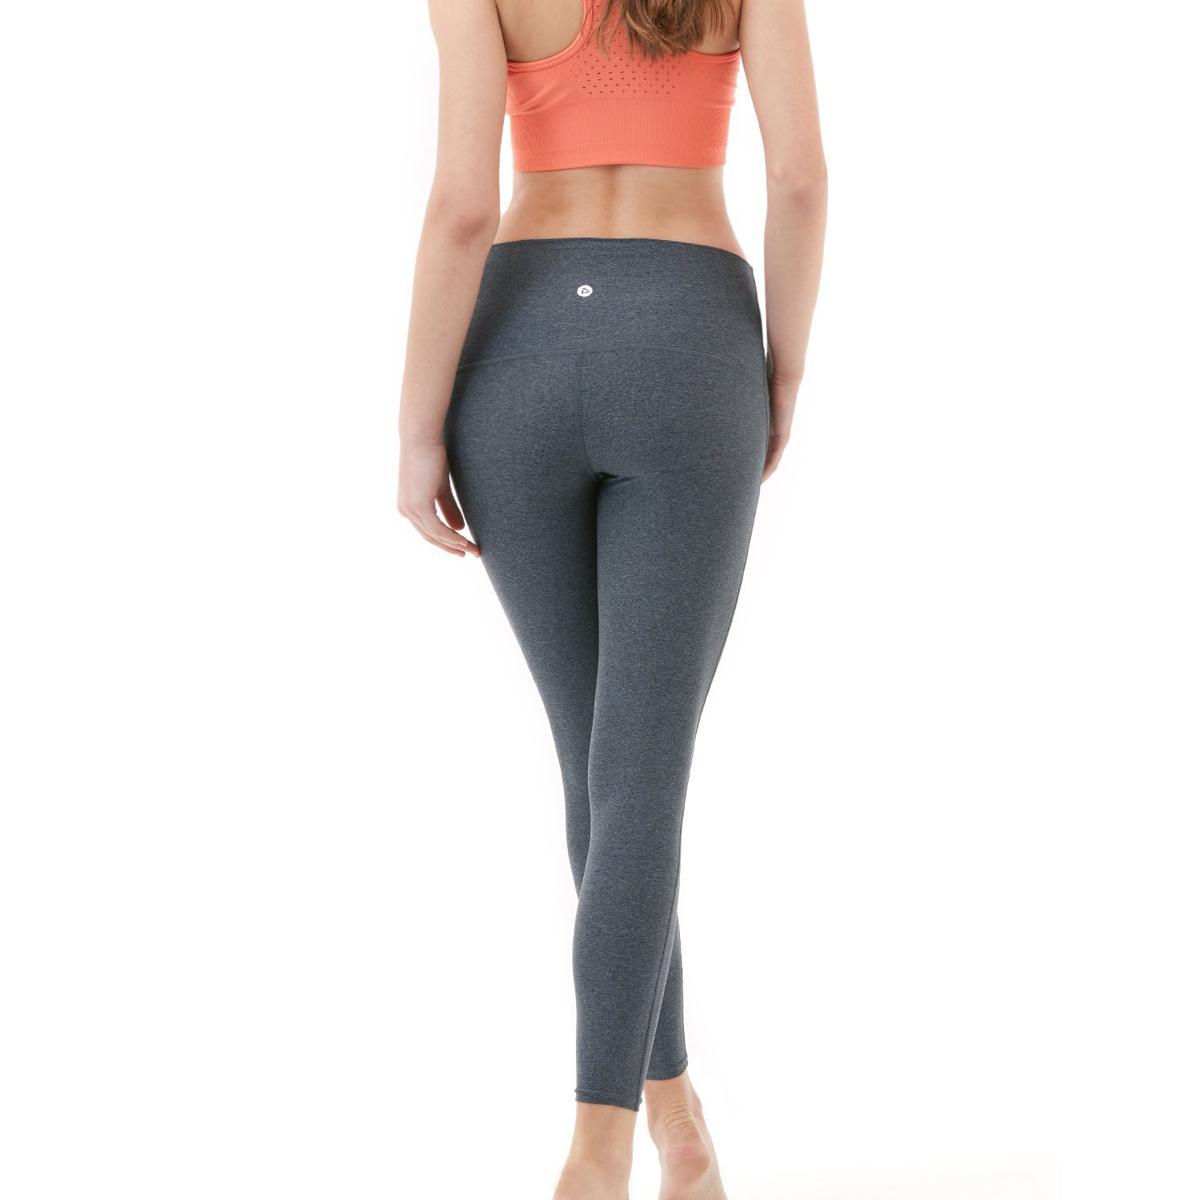 thumbnail 10 - TSLA Tesla FYP42 Women's High-Waisted Ultra-Stretch Tummy Control Yoga Pants